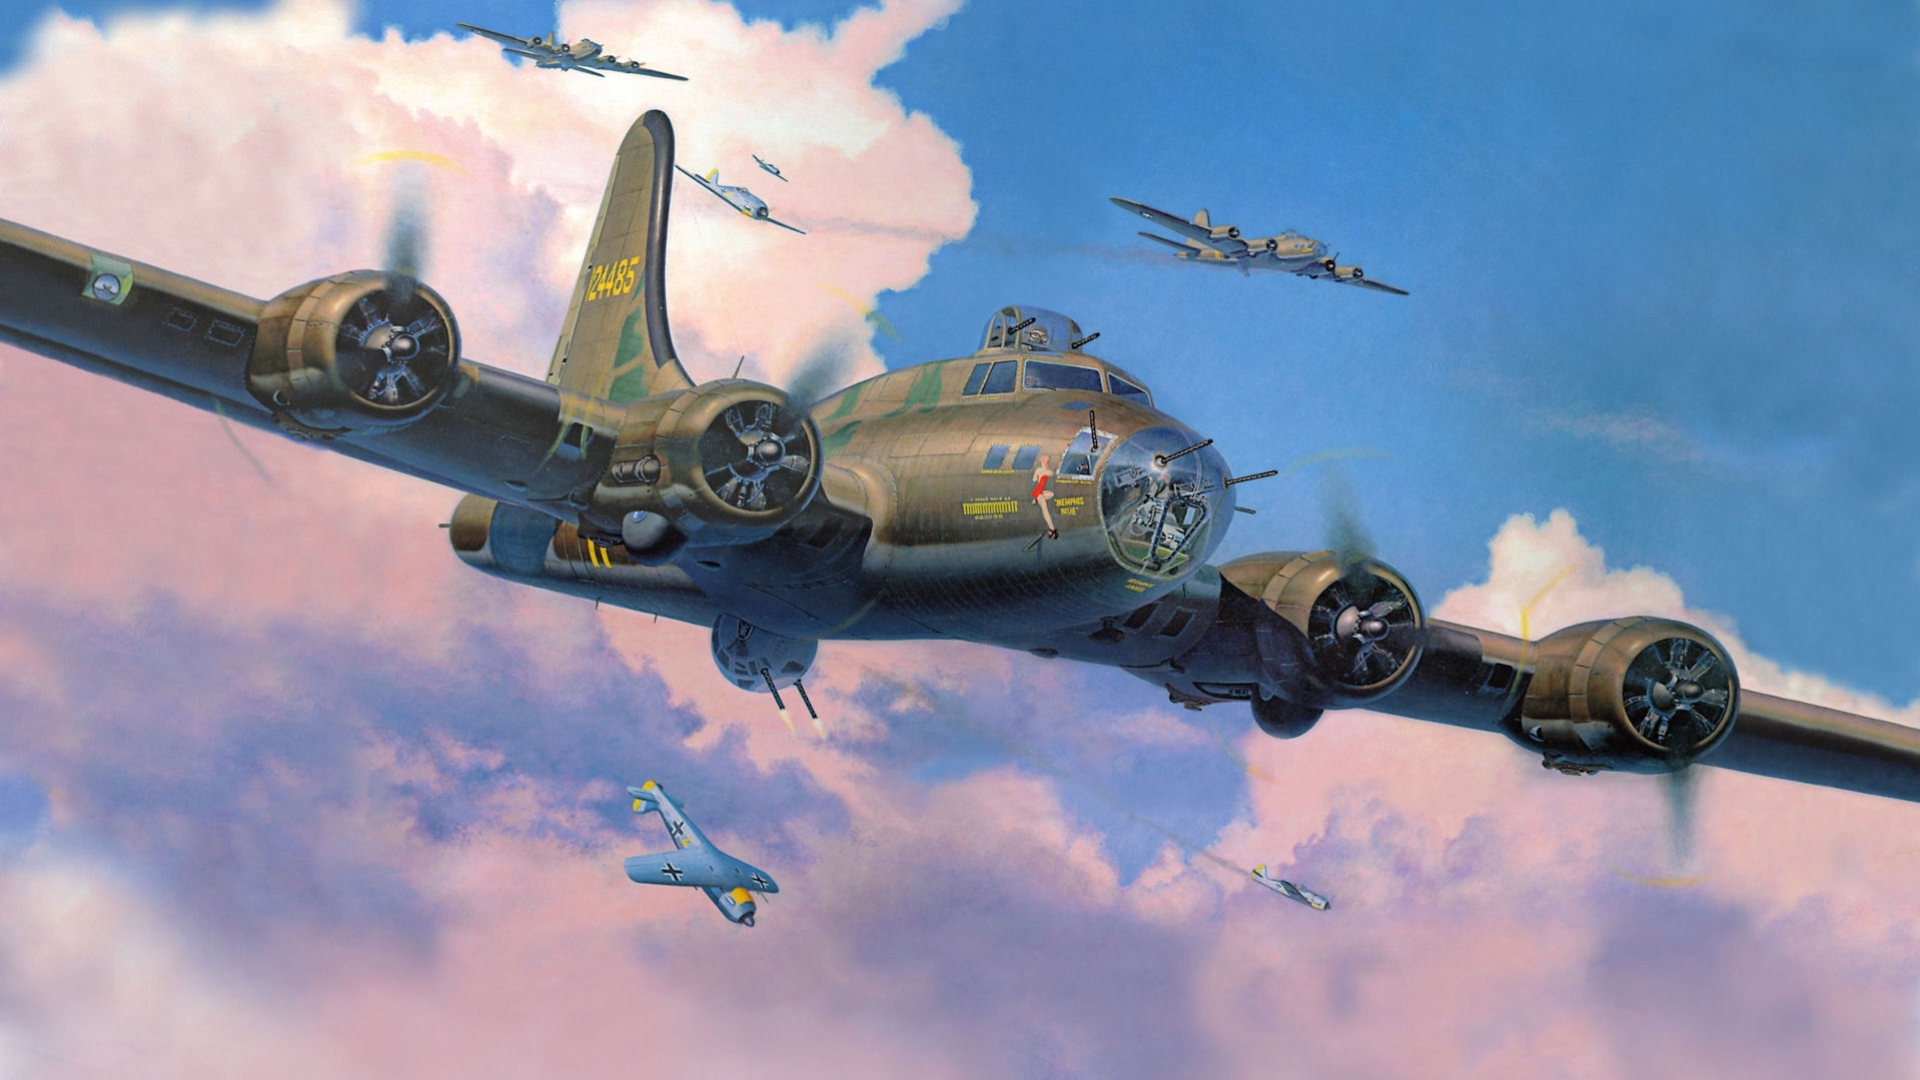 Boeing B 17 Flying Fortress Wallpaper 87744 1920x1080